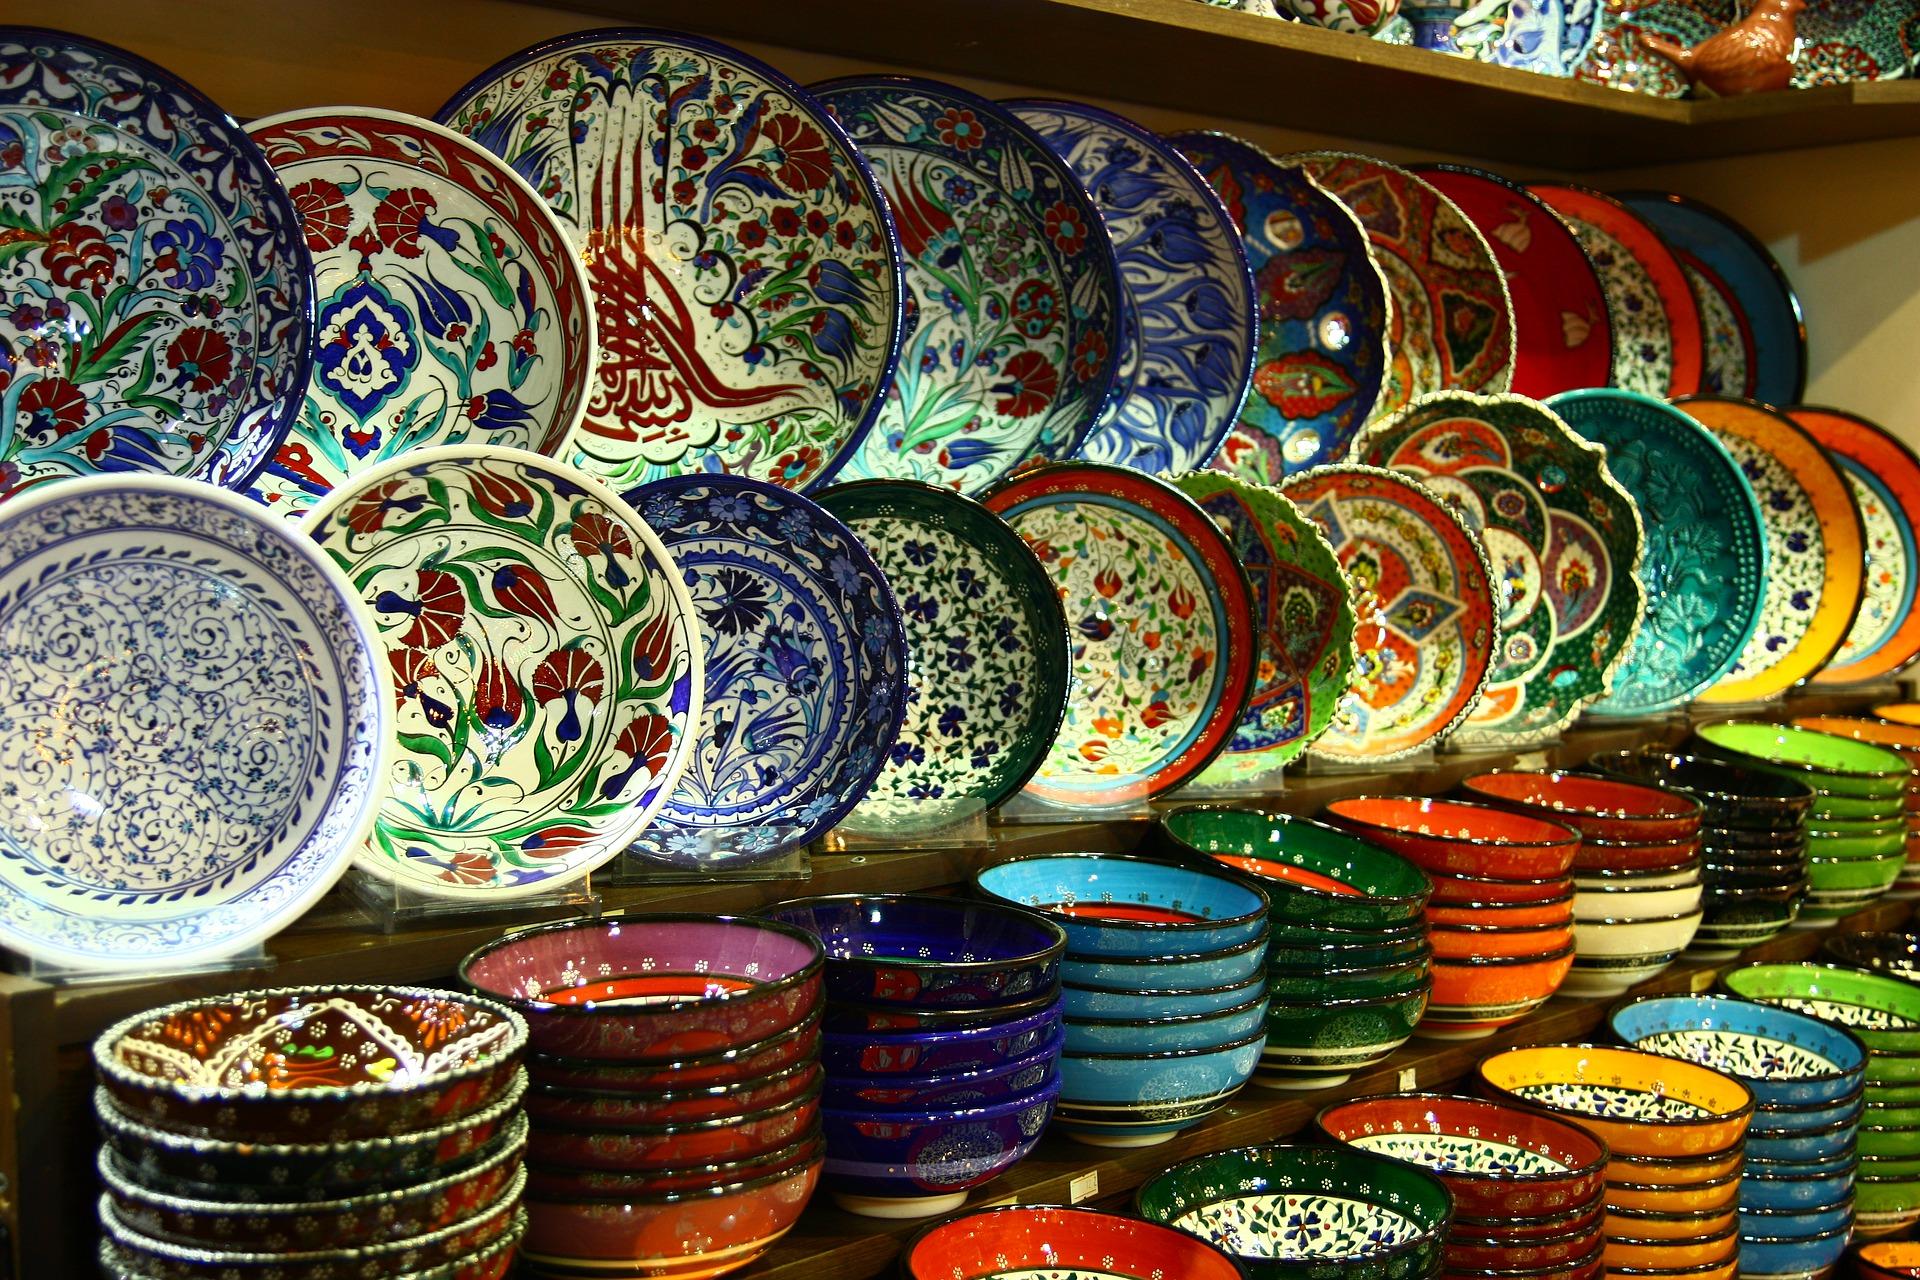 shopping i kappadokien, shopping i avanos, shopping i göreme, shopping i nevsehir, shopping i göreme, shopping i tyrkiet, keramik i avanos, tyrkisk vin i kappadokien, tyrkiske tæpper, oplevelser i kappadokien, oplevelser i cappadocia